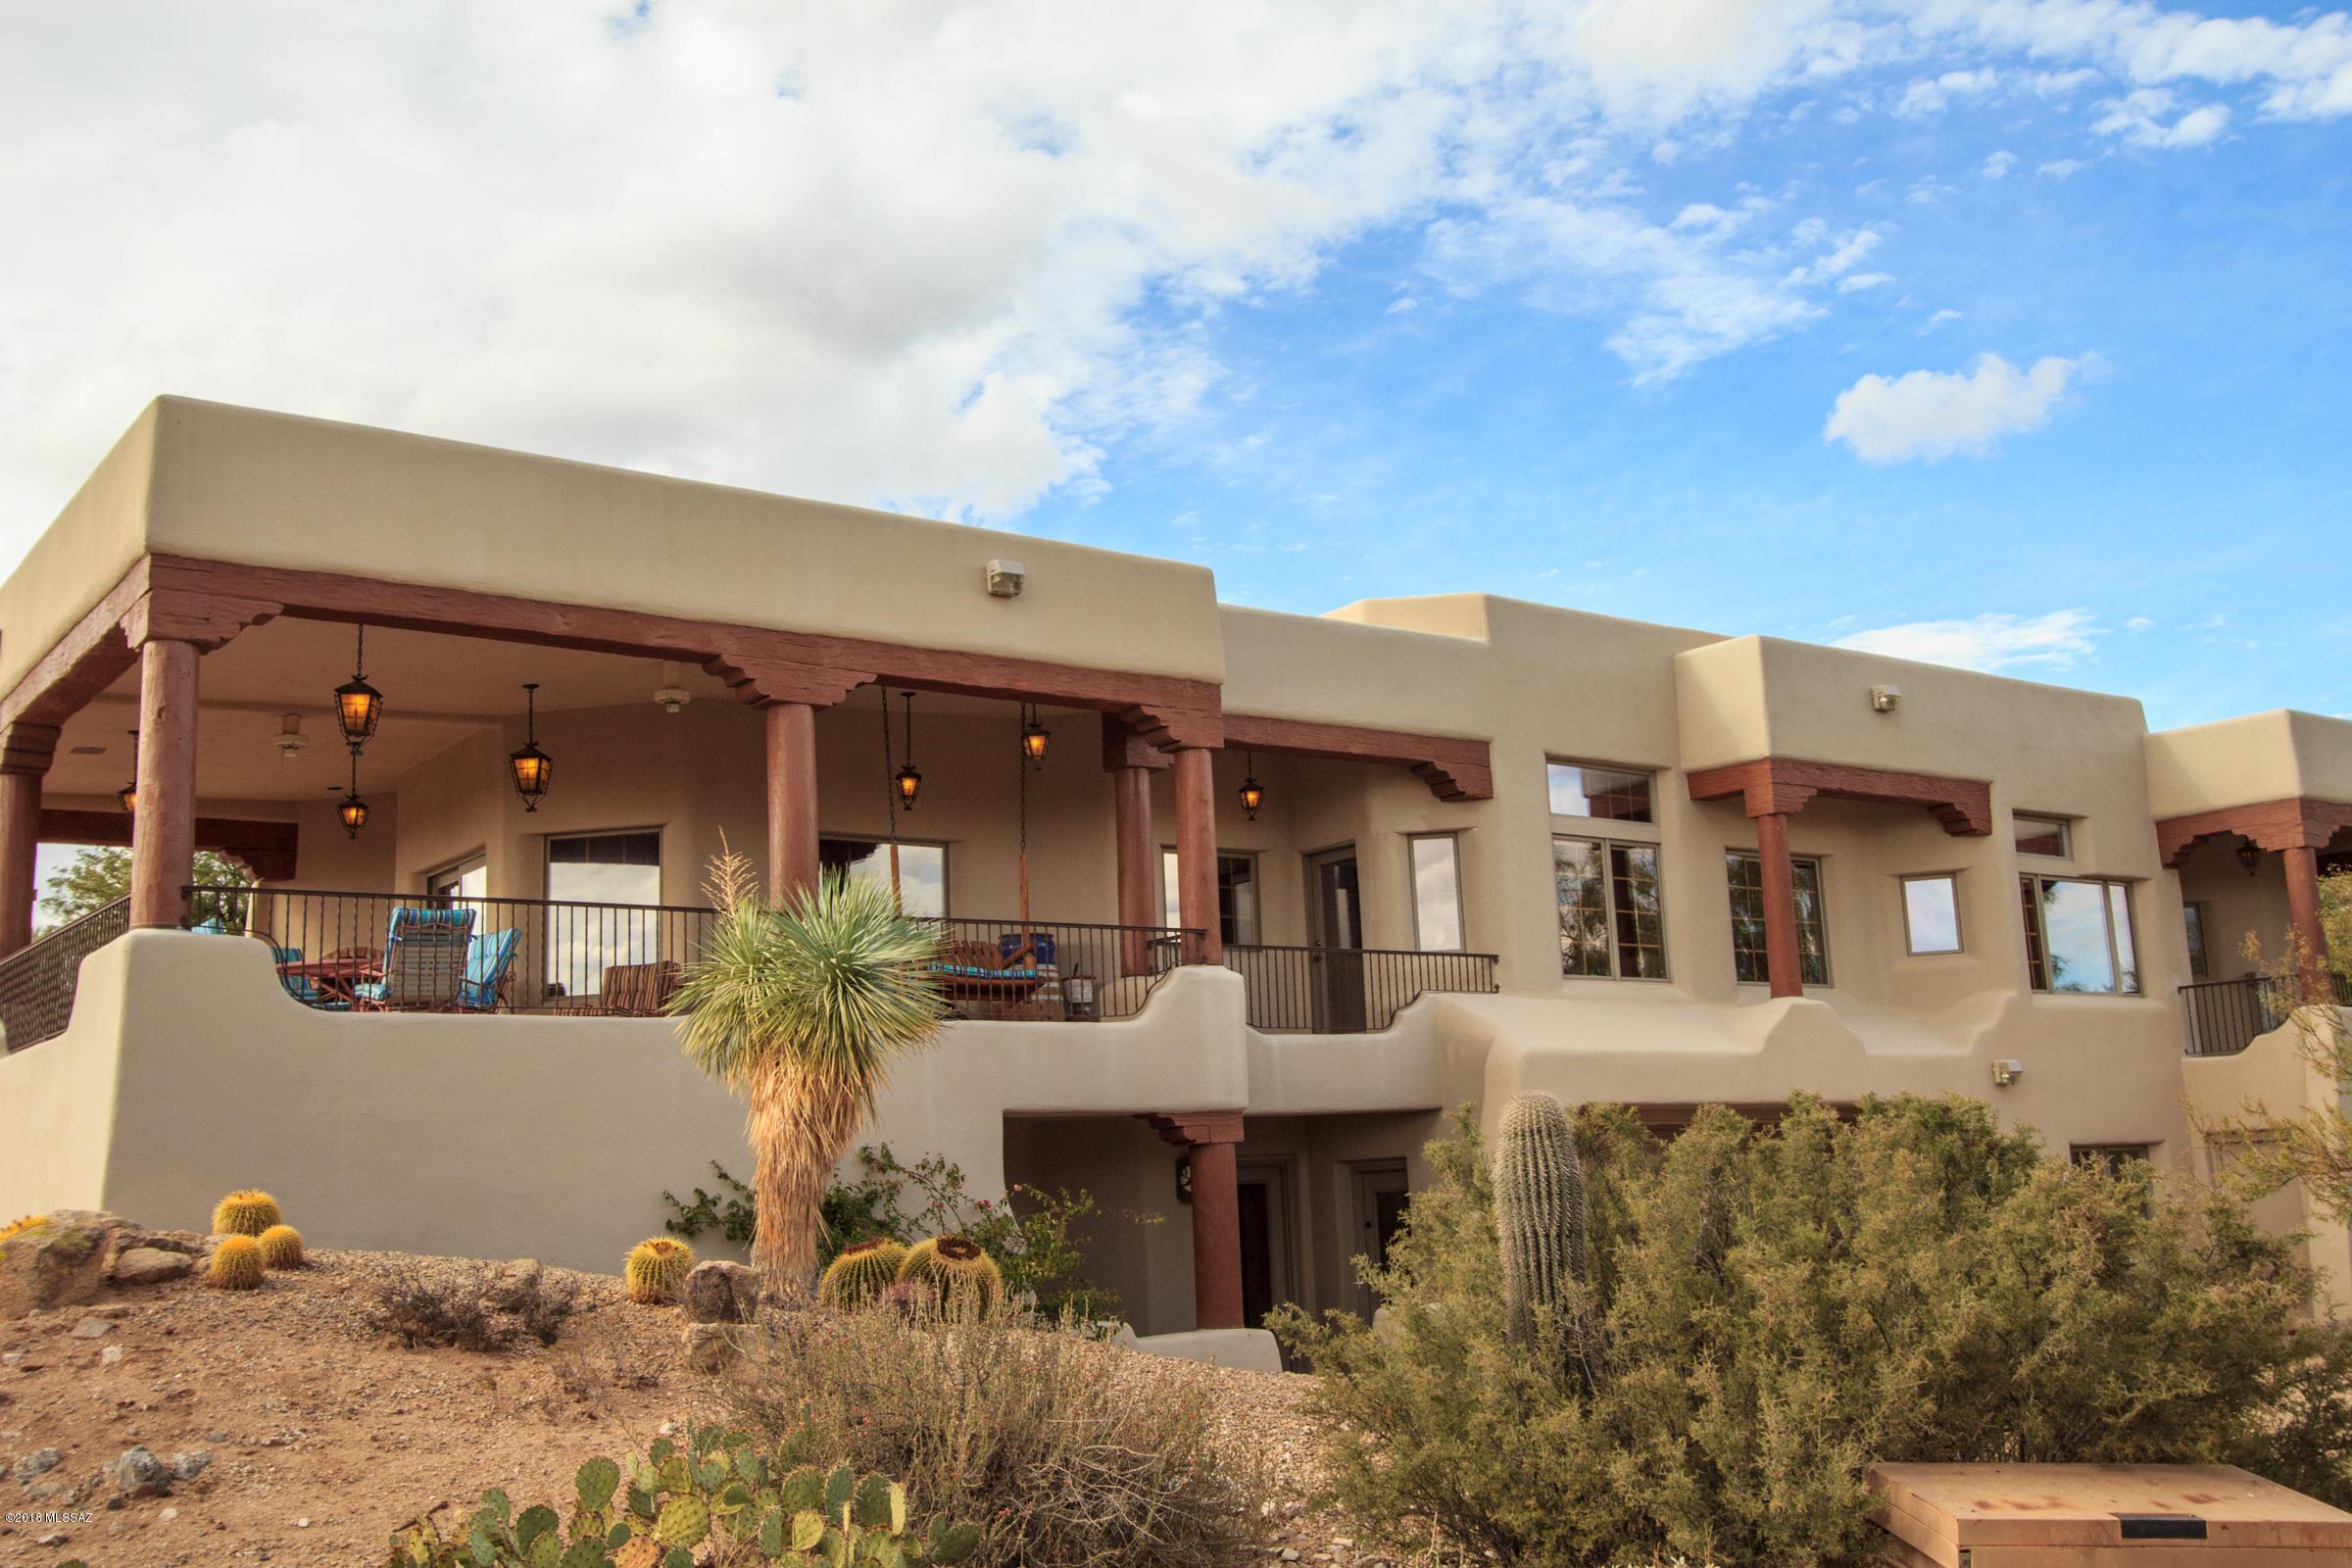 Fullsize Of Right Away Disposal Tucson